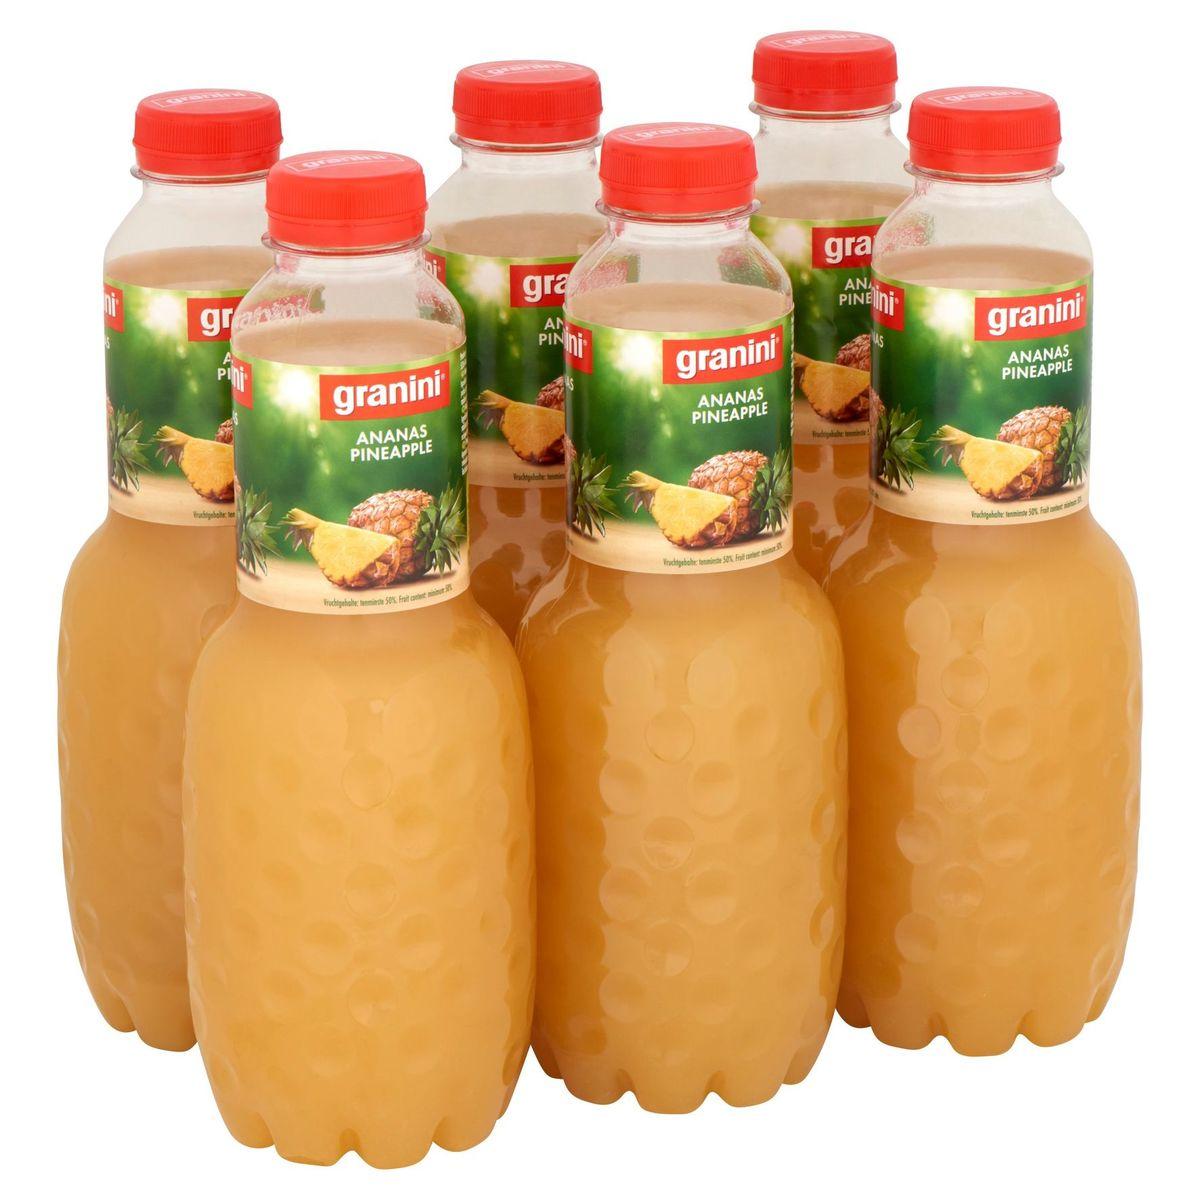 granini Ananas 6 x 1 L